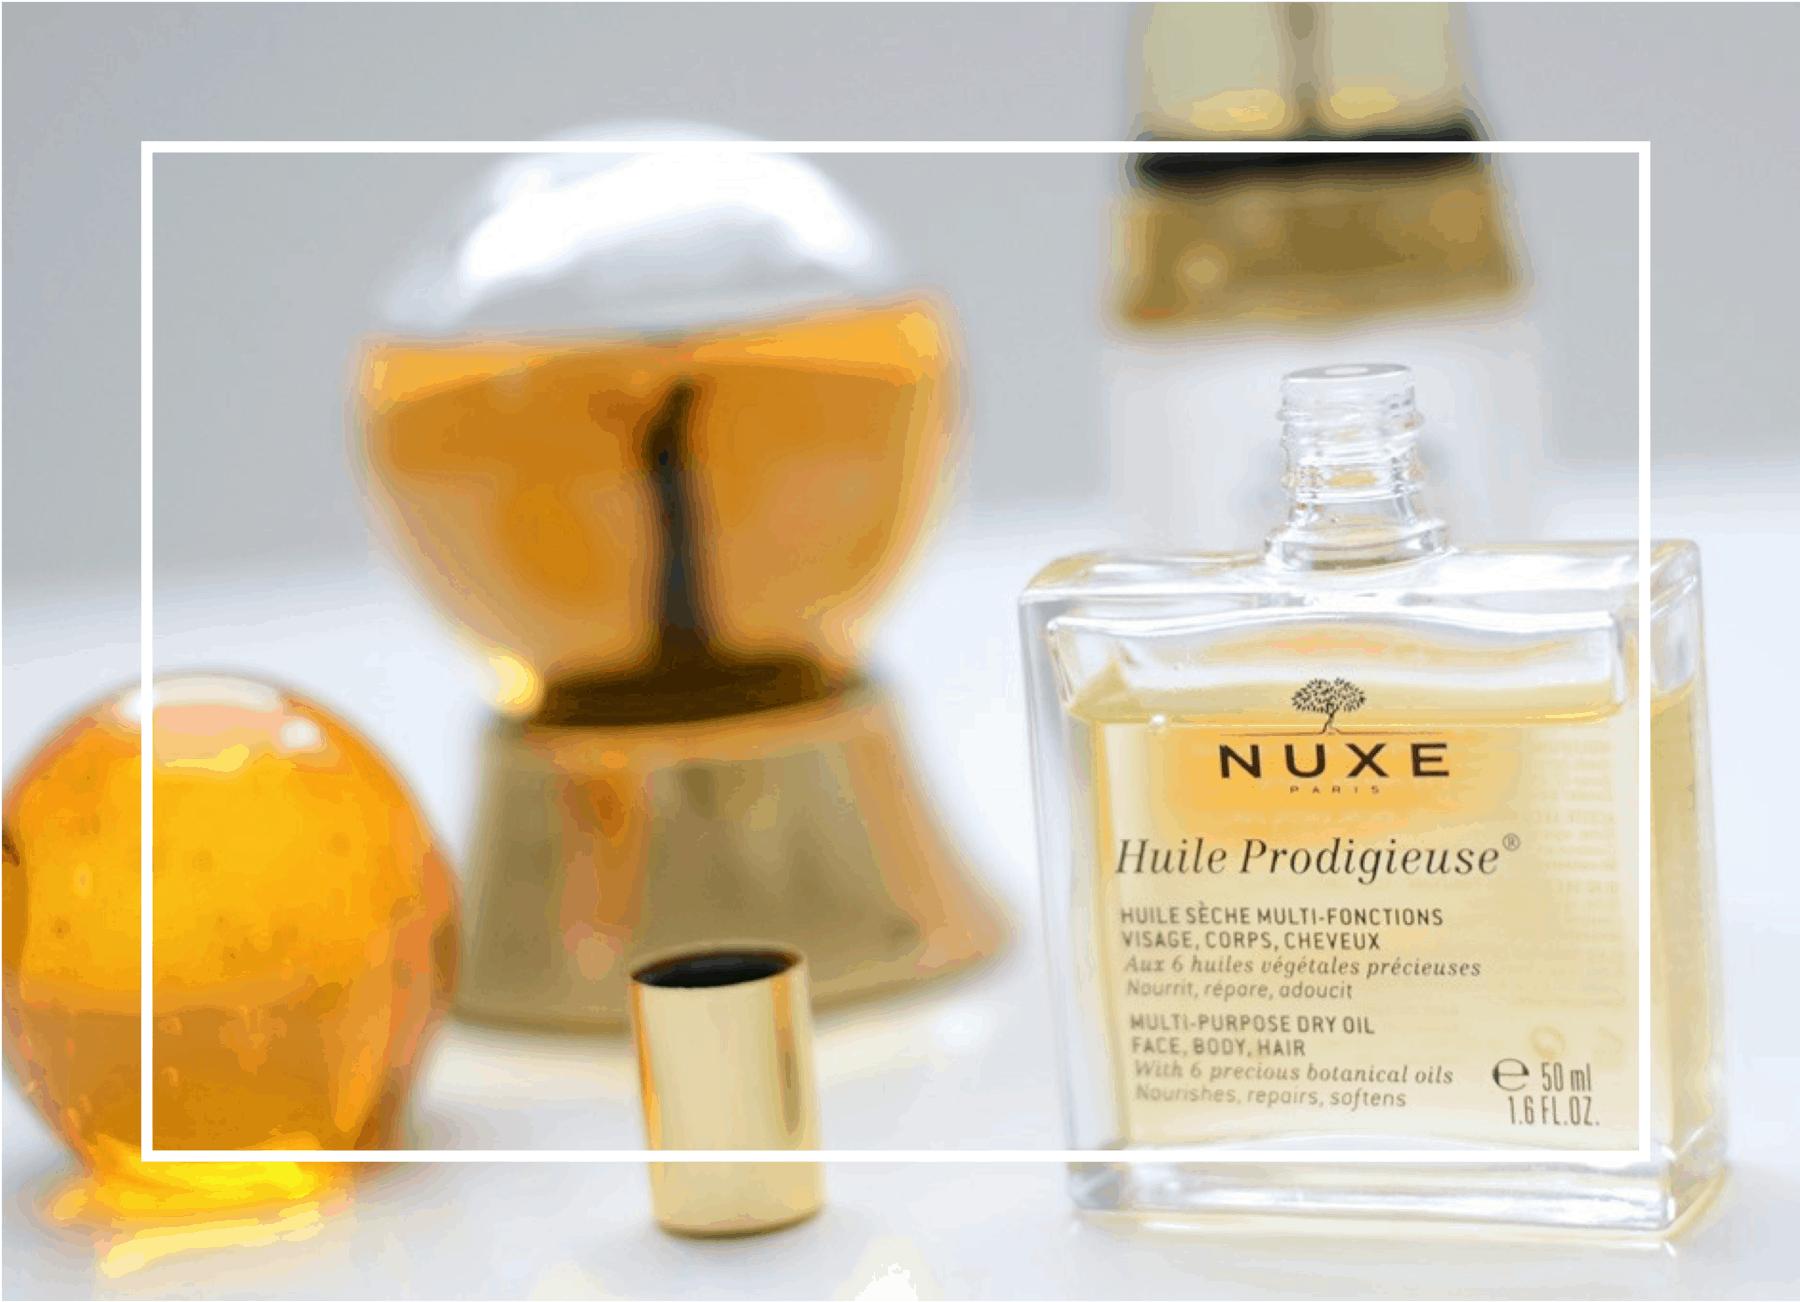 Nuxe Huile Prodigieuse multipurpose dry oil OuiPlease Beauty OuiBlog